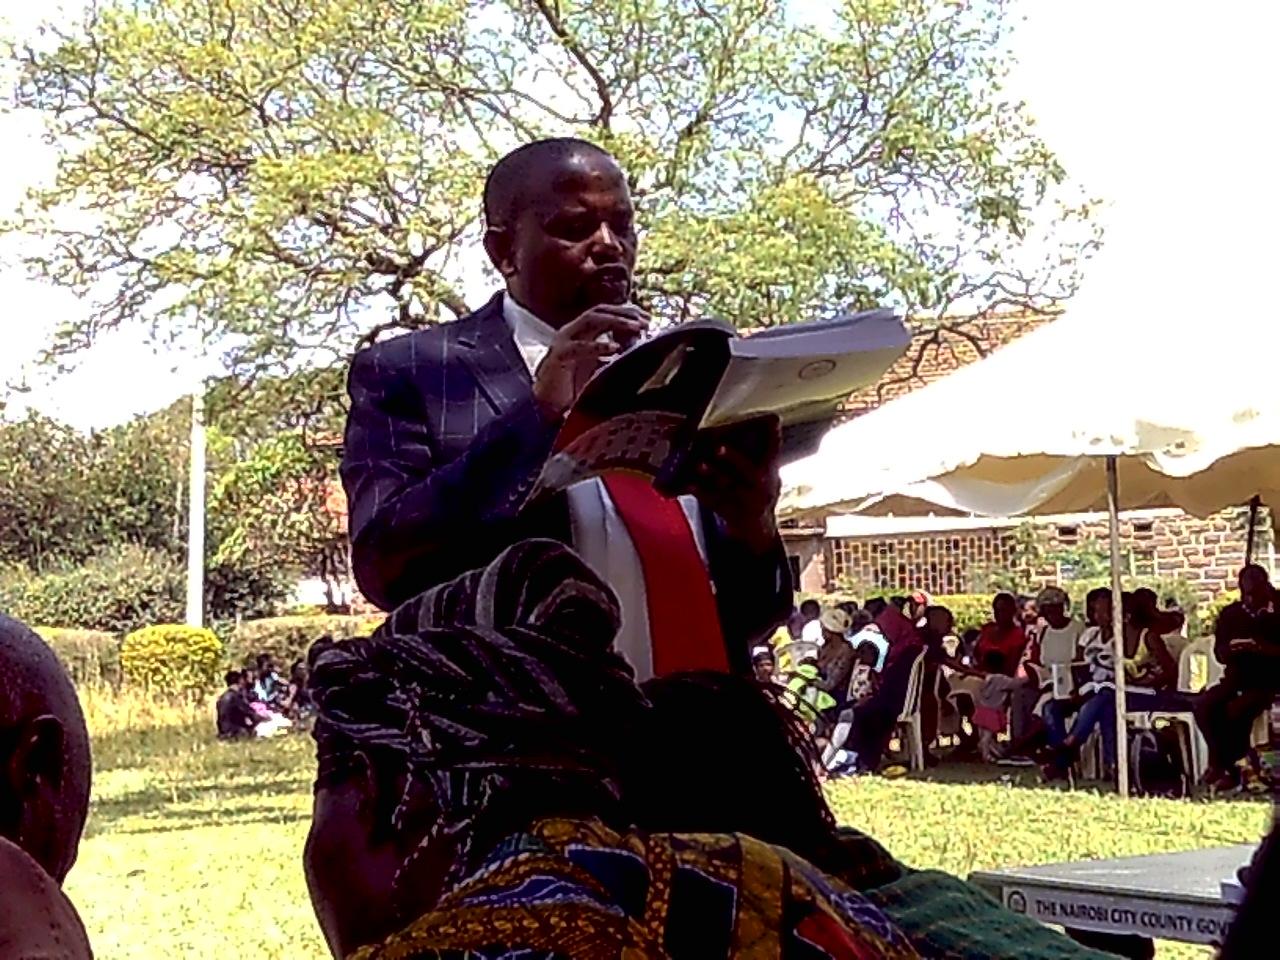 Nairobi County Official presiding over the public participation forum at Joseph Kangethe Woodley